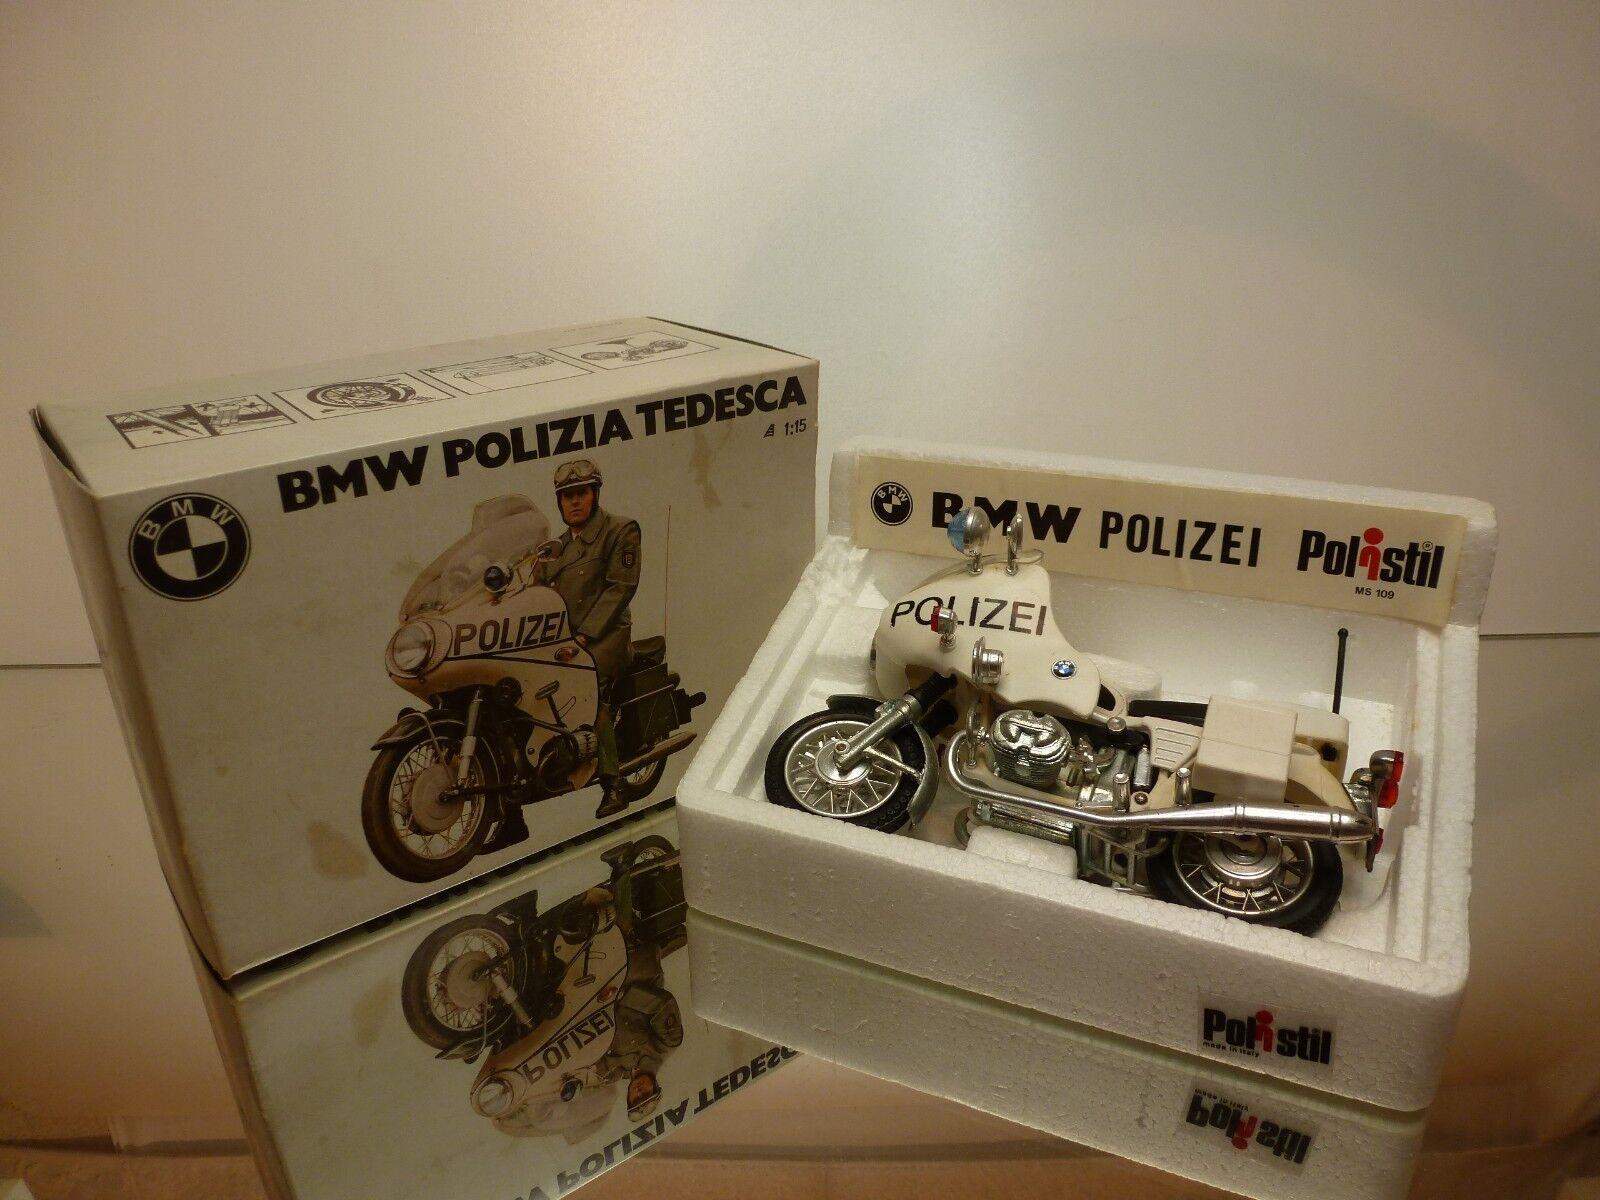 POLISTIL MS109 BMW R75 5 POLIZEI POLIZIA TEDESCA - OFF-Weiß 1 15 - GOOD IN BOX